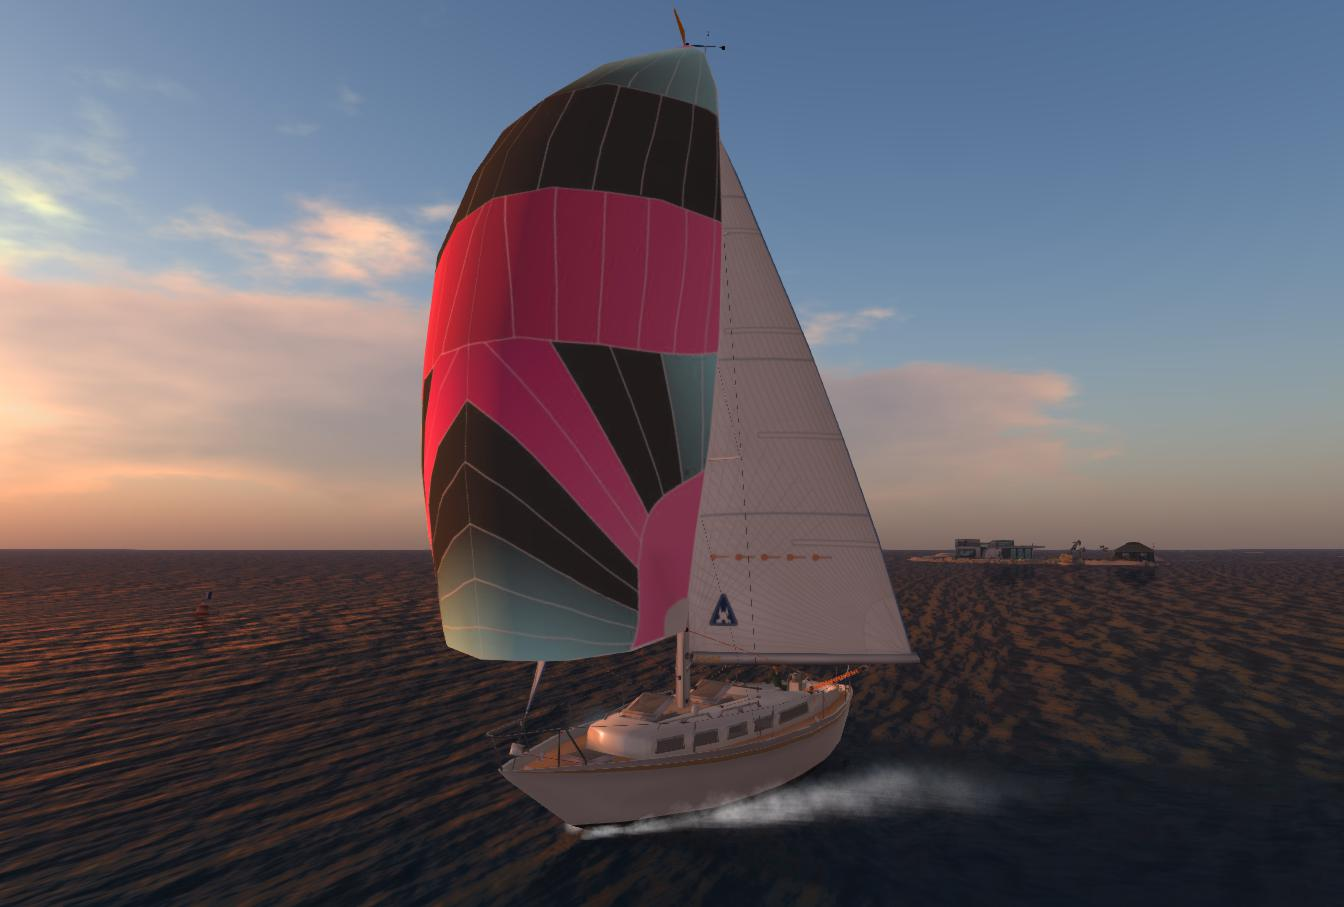 Sailboat around Bellisseria | Austin Tate's Blog